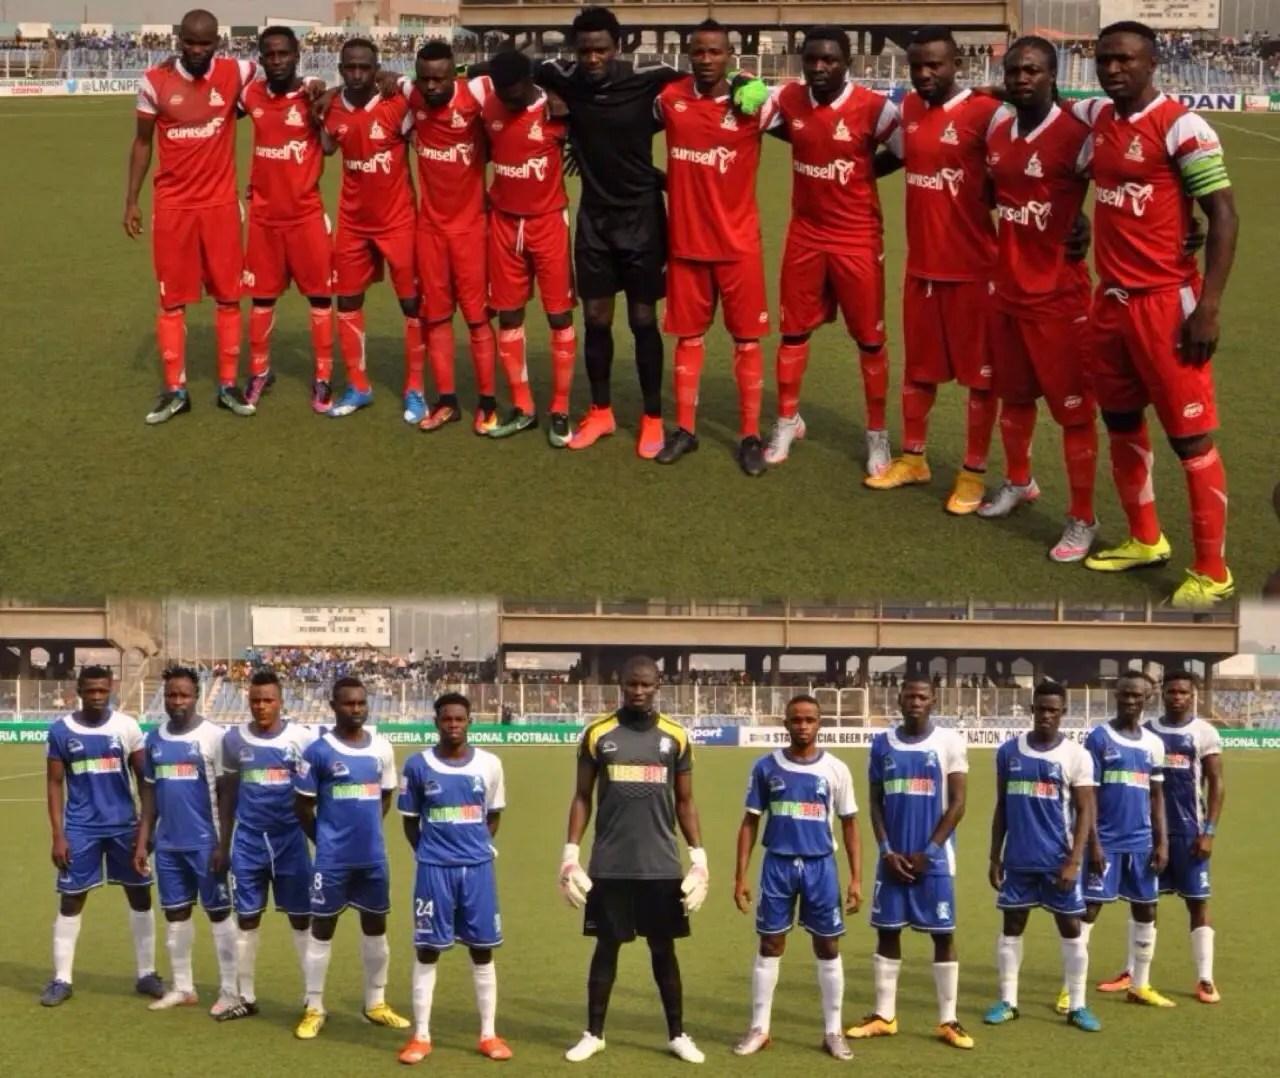 NPFL: Odumegwu Scores As Dominant Rivers United Pip 3SC